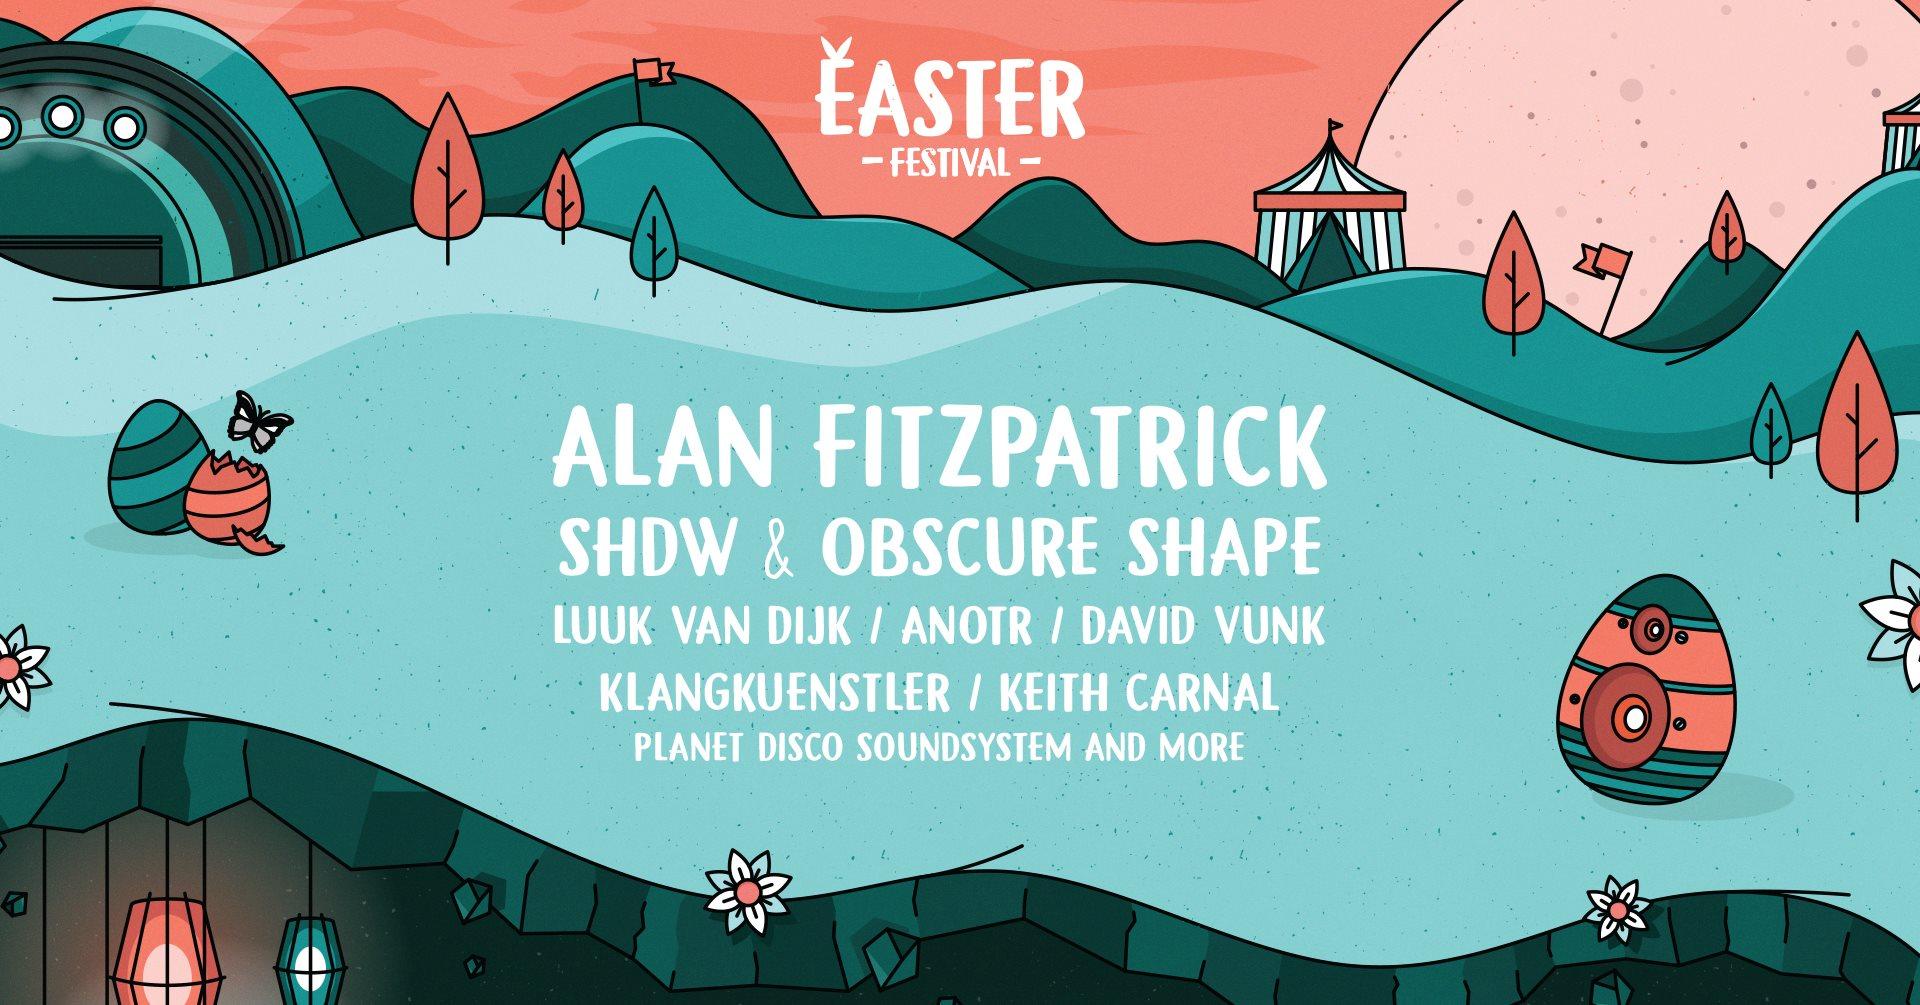 Braaf Easter Festival